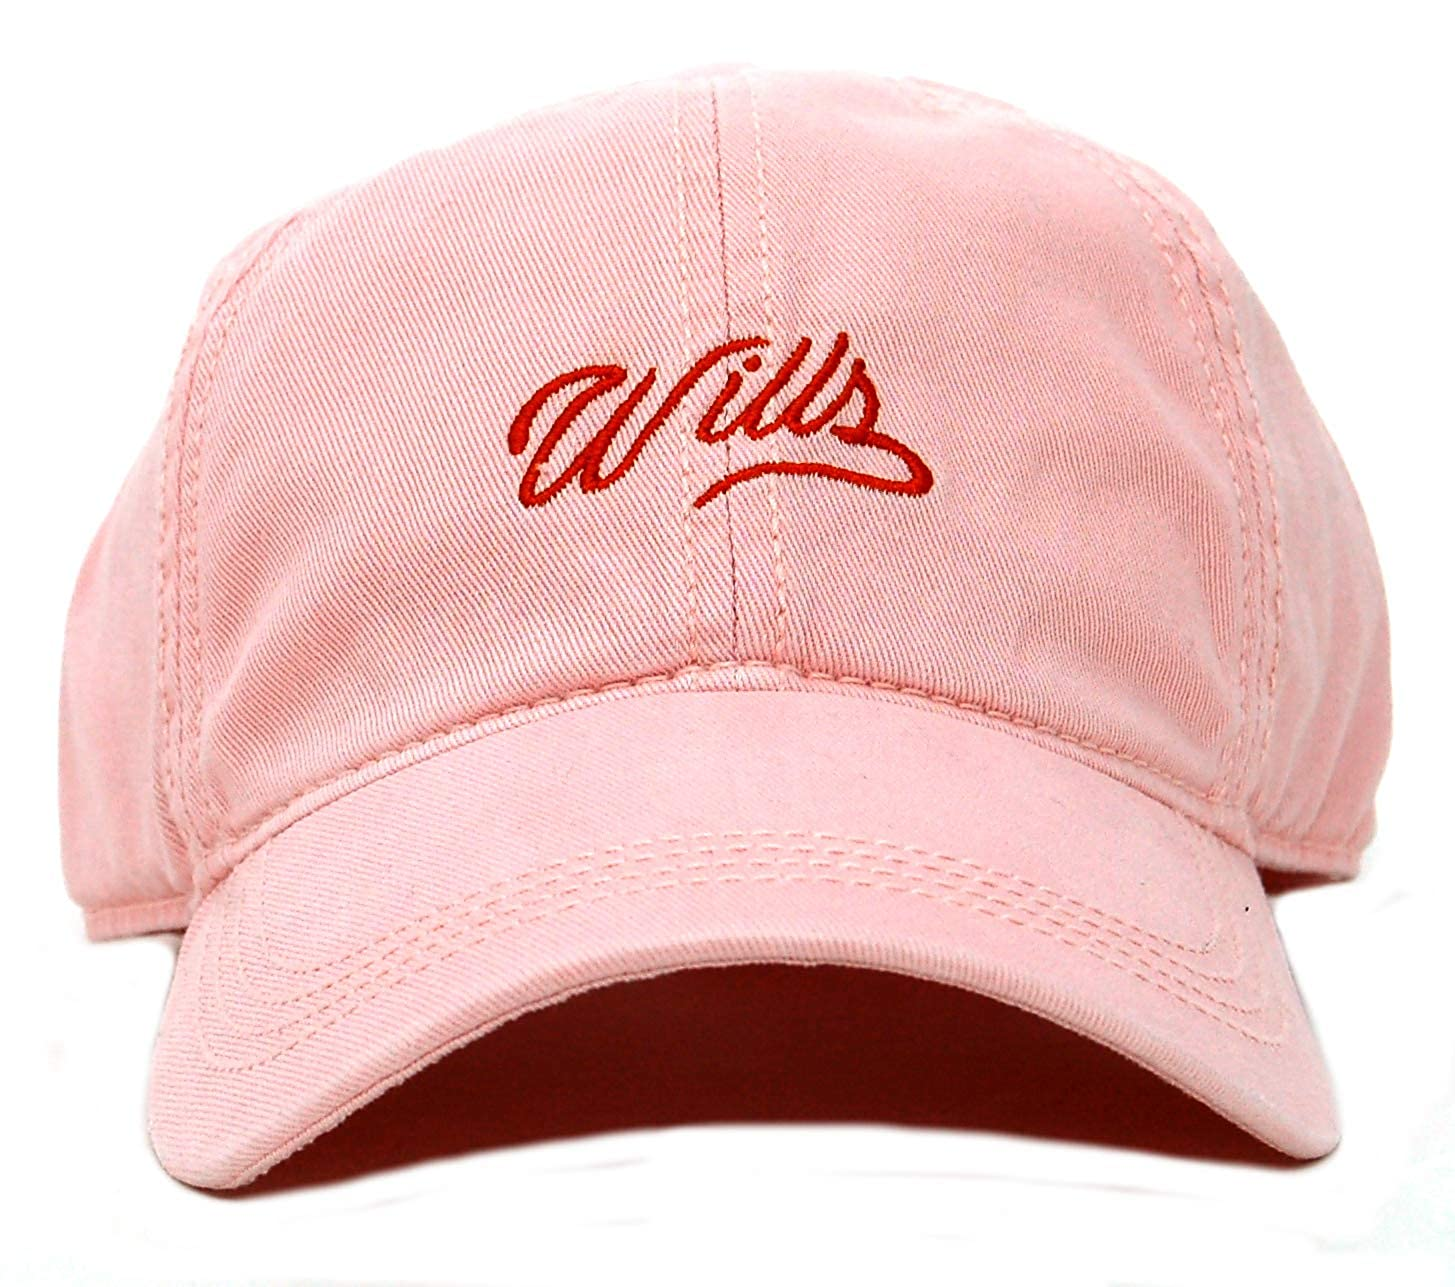 Jack Wills Enfield Wills Script Pink Baseball Cap in 100/% Cotton